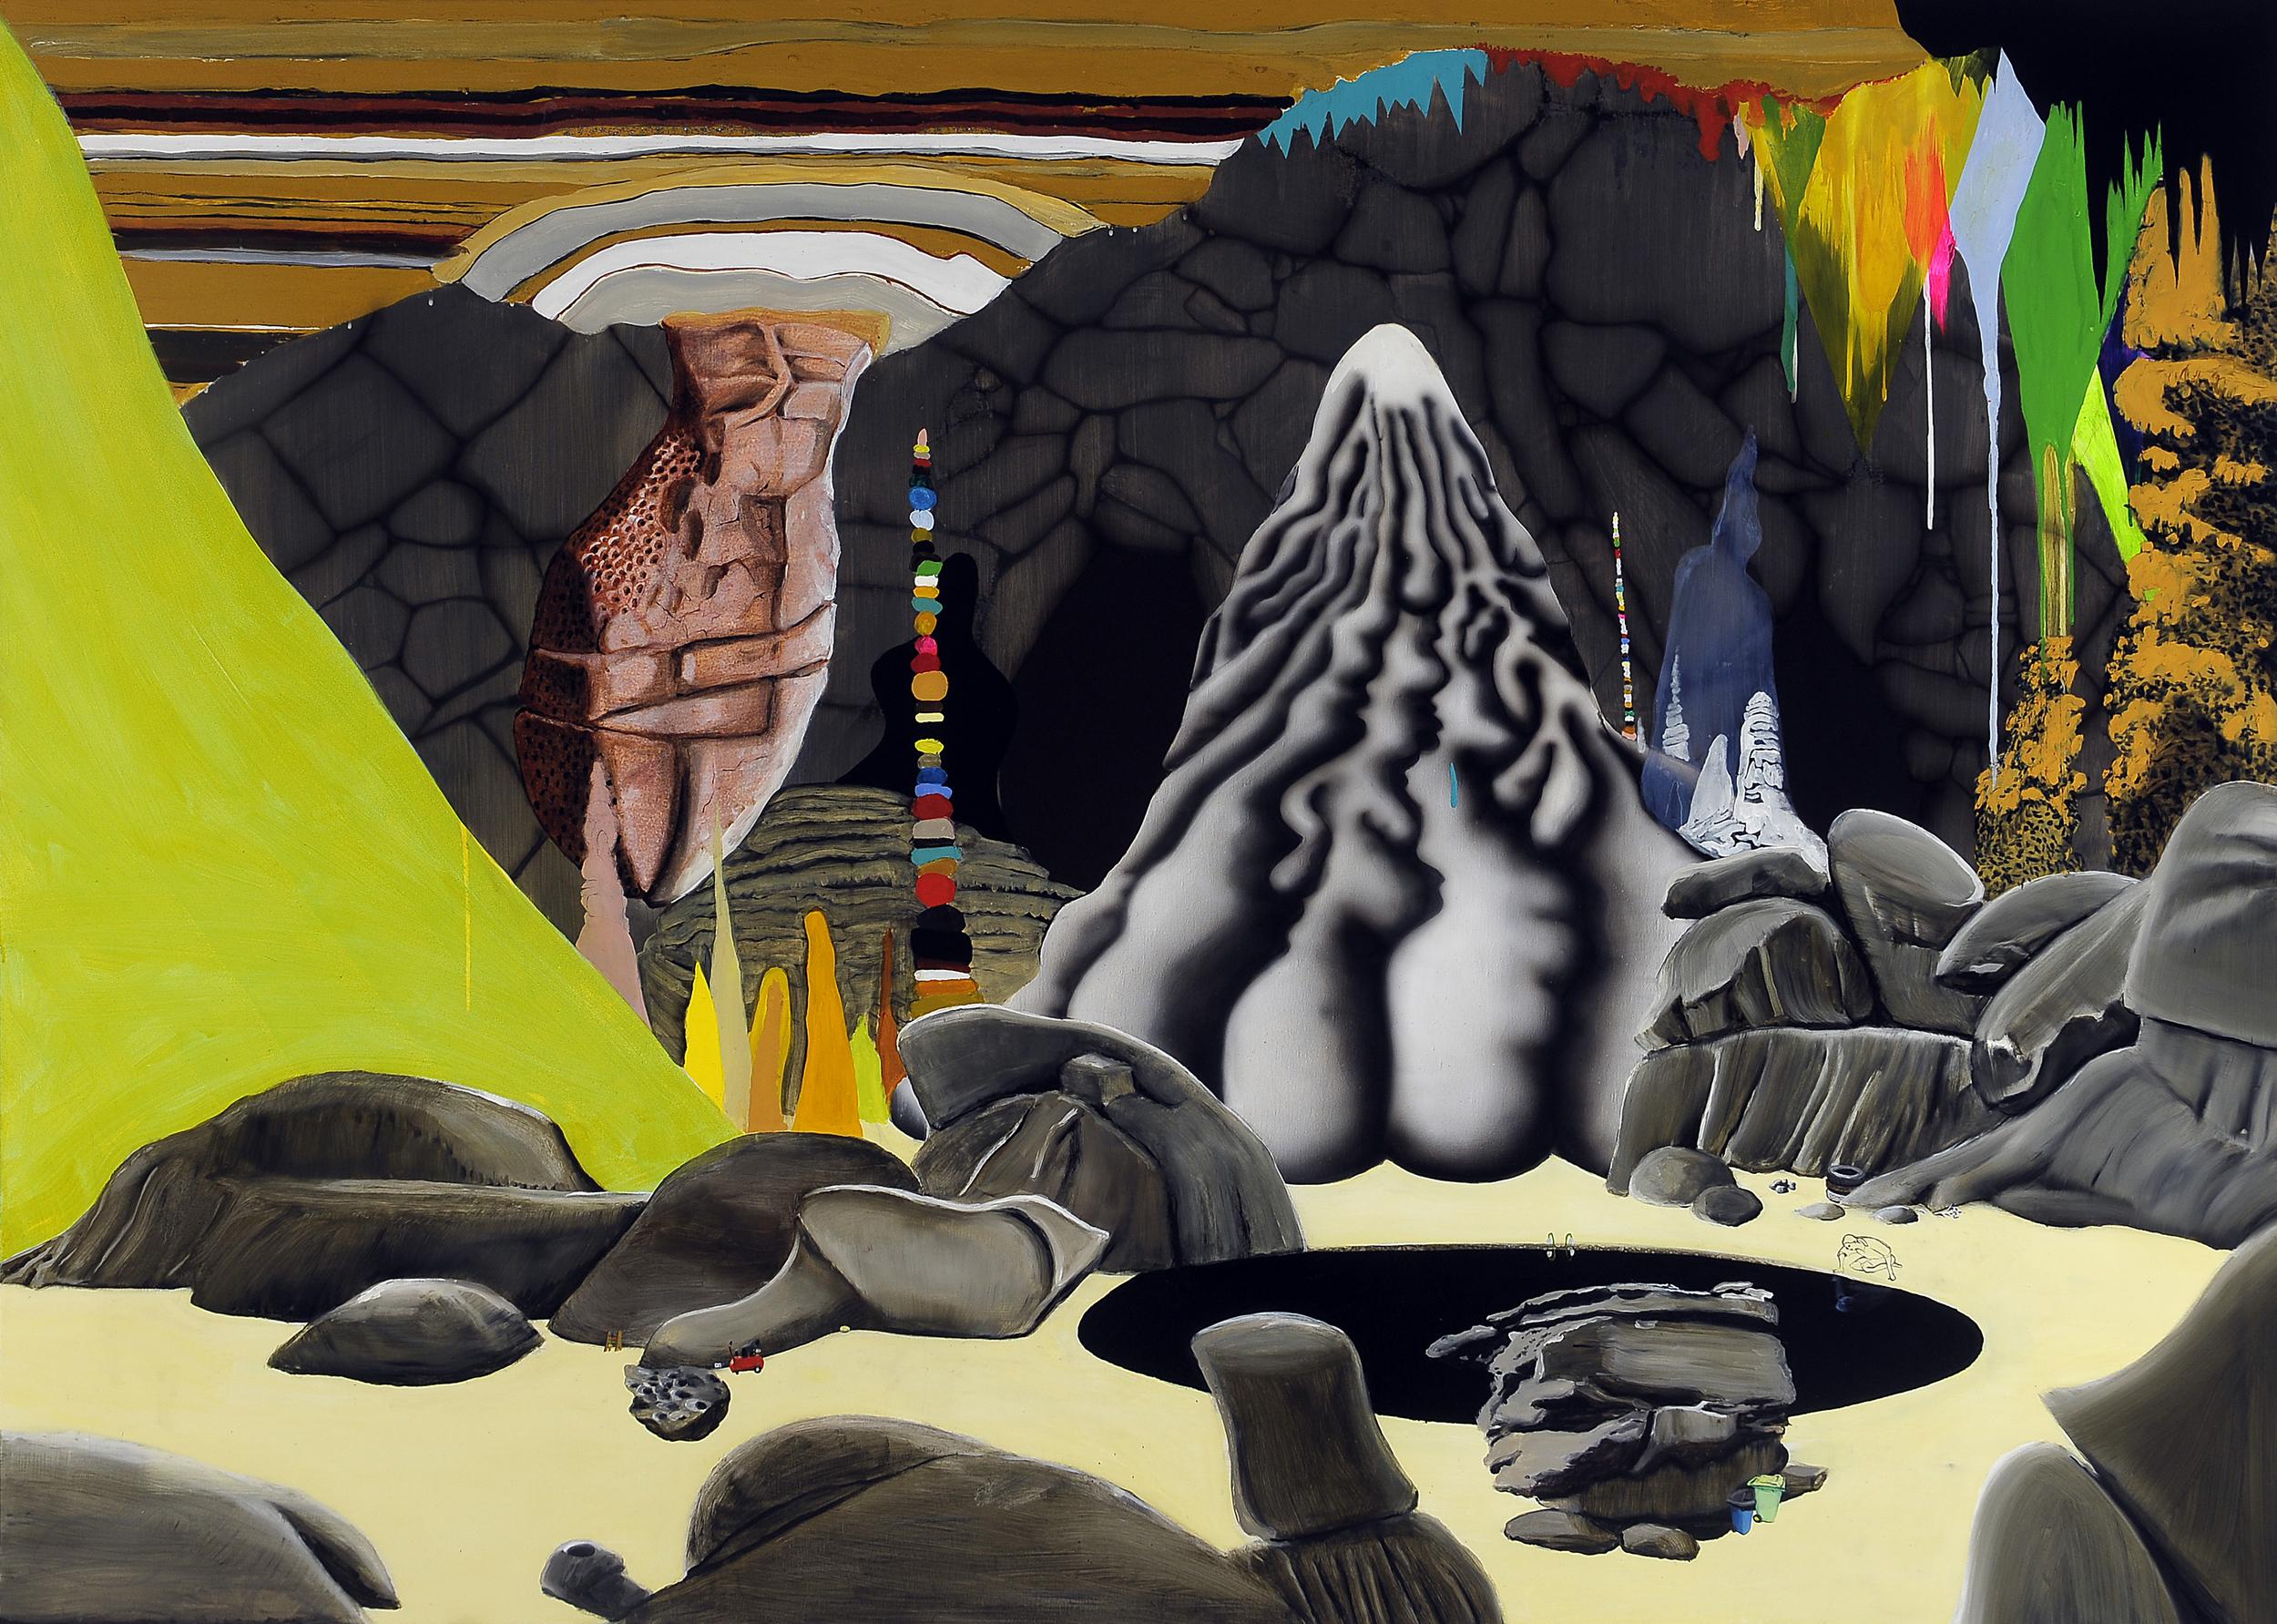 Cavedreams,  2008 Acrylic, oil and enamel on linen 150 x 250cm